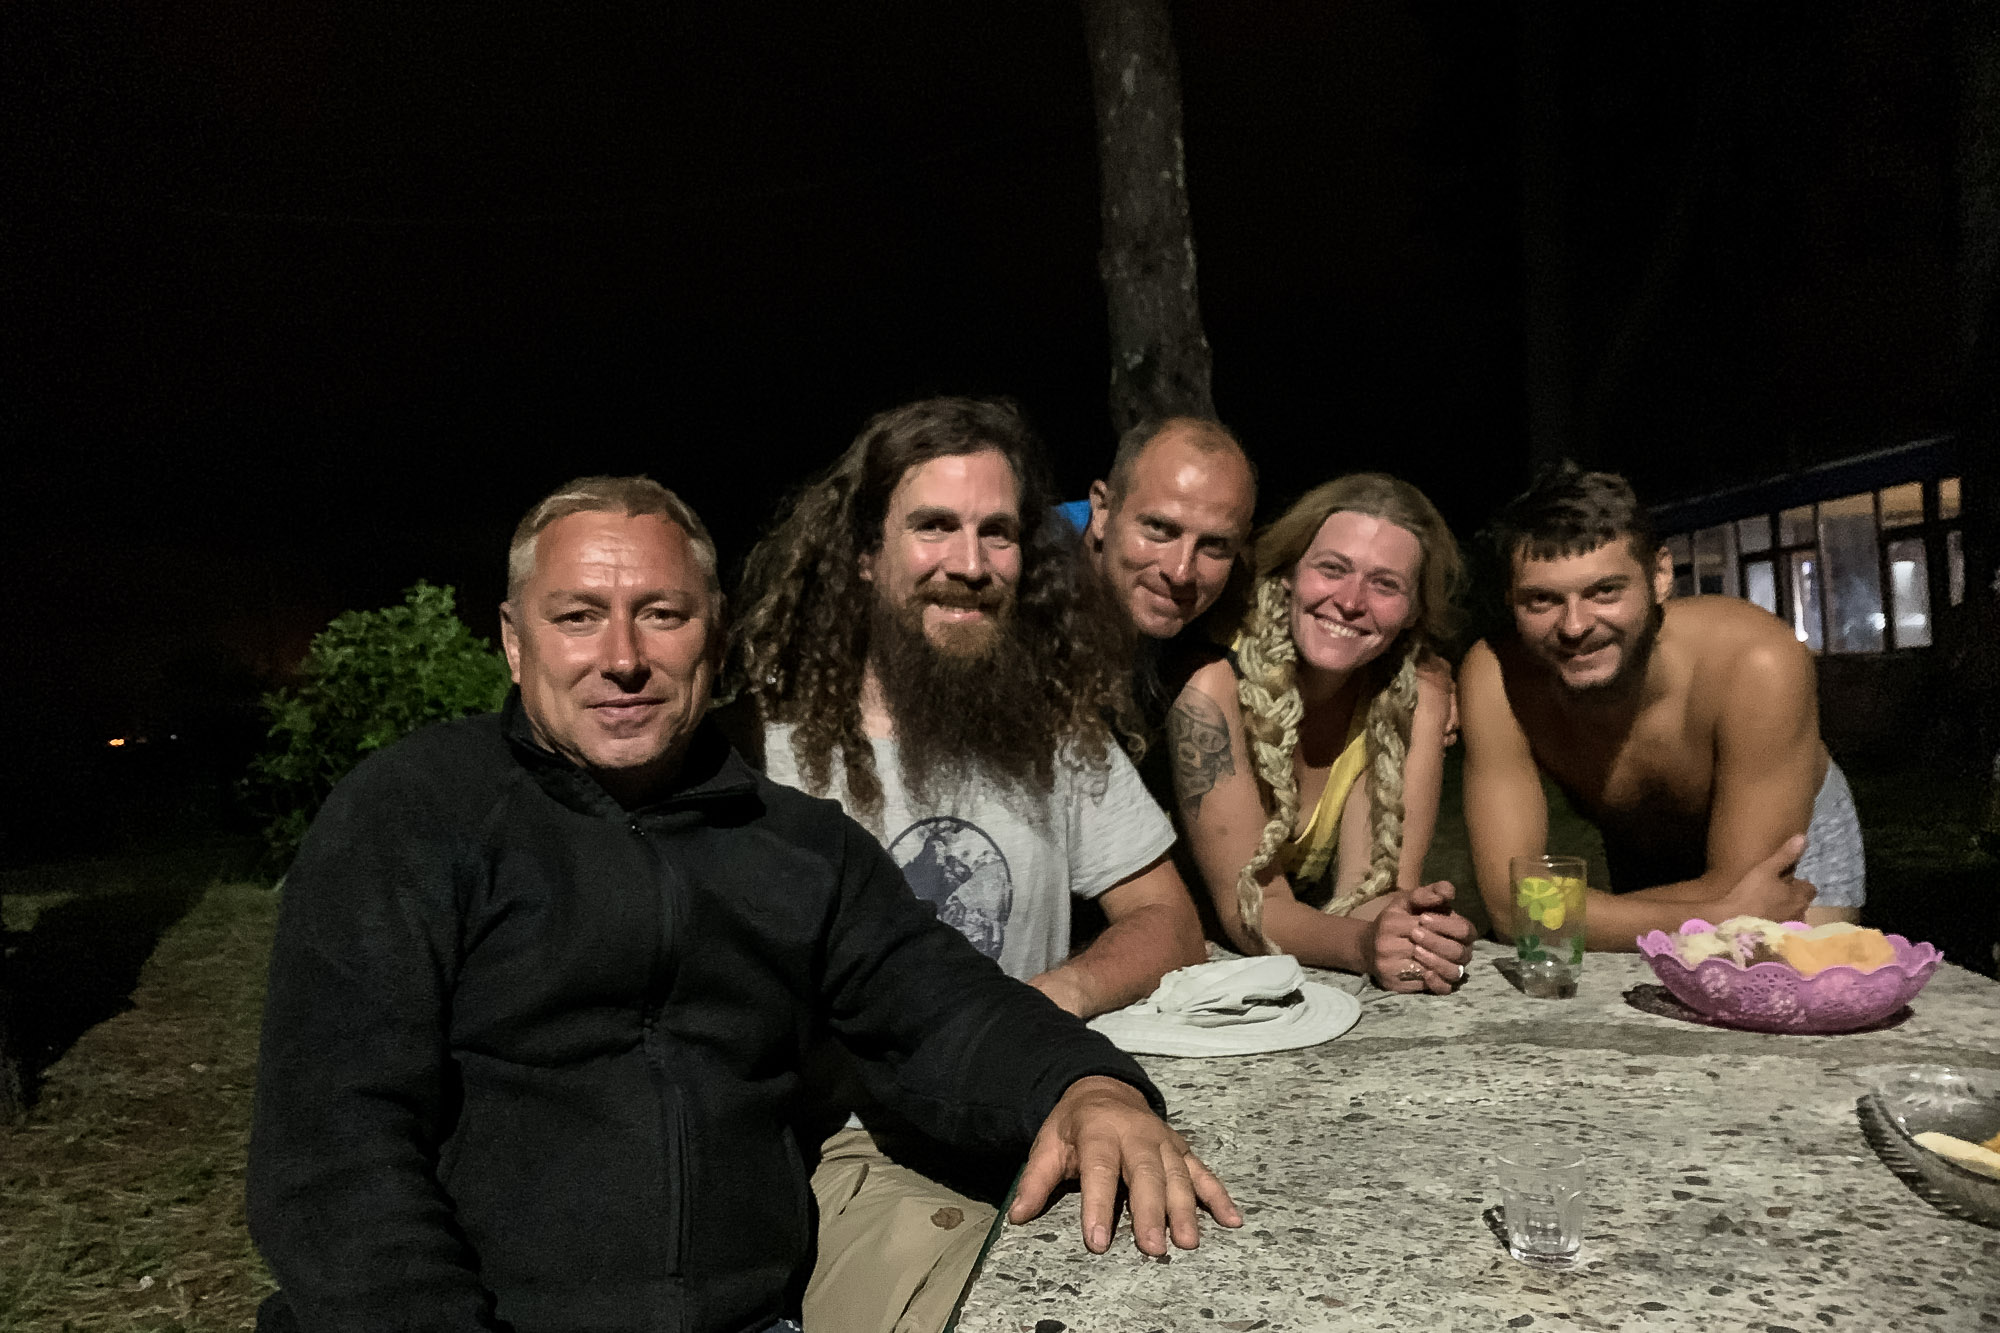 friendly Russians